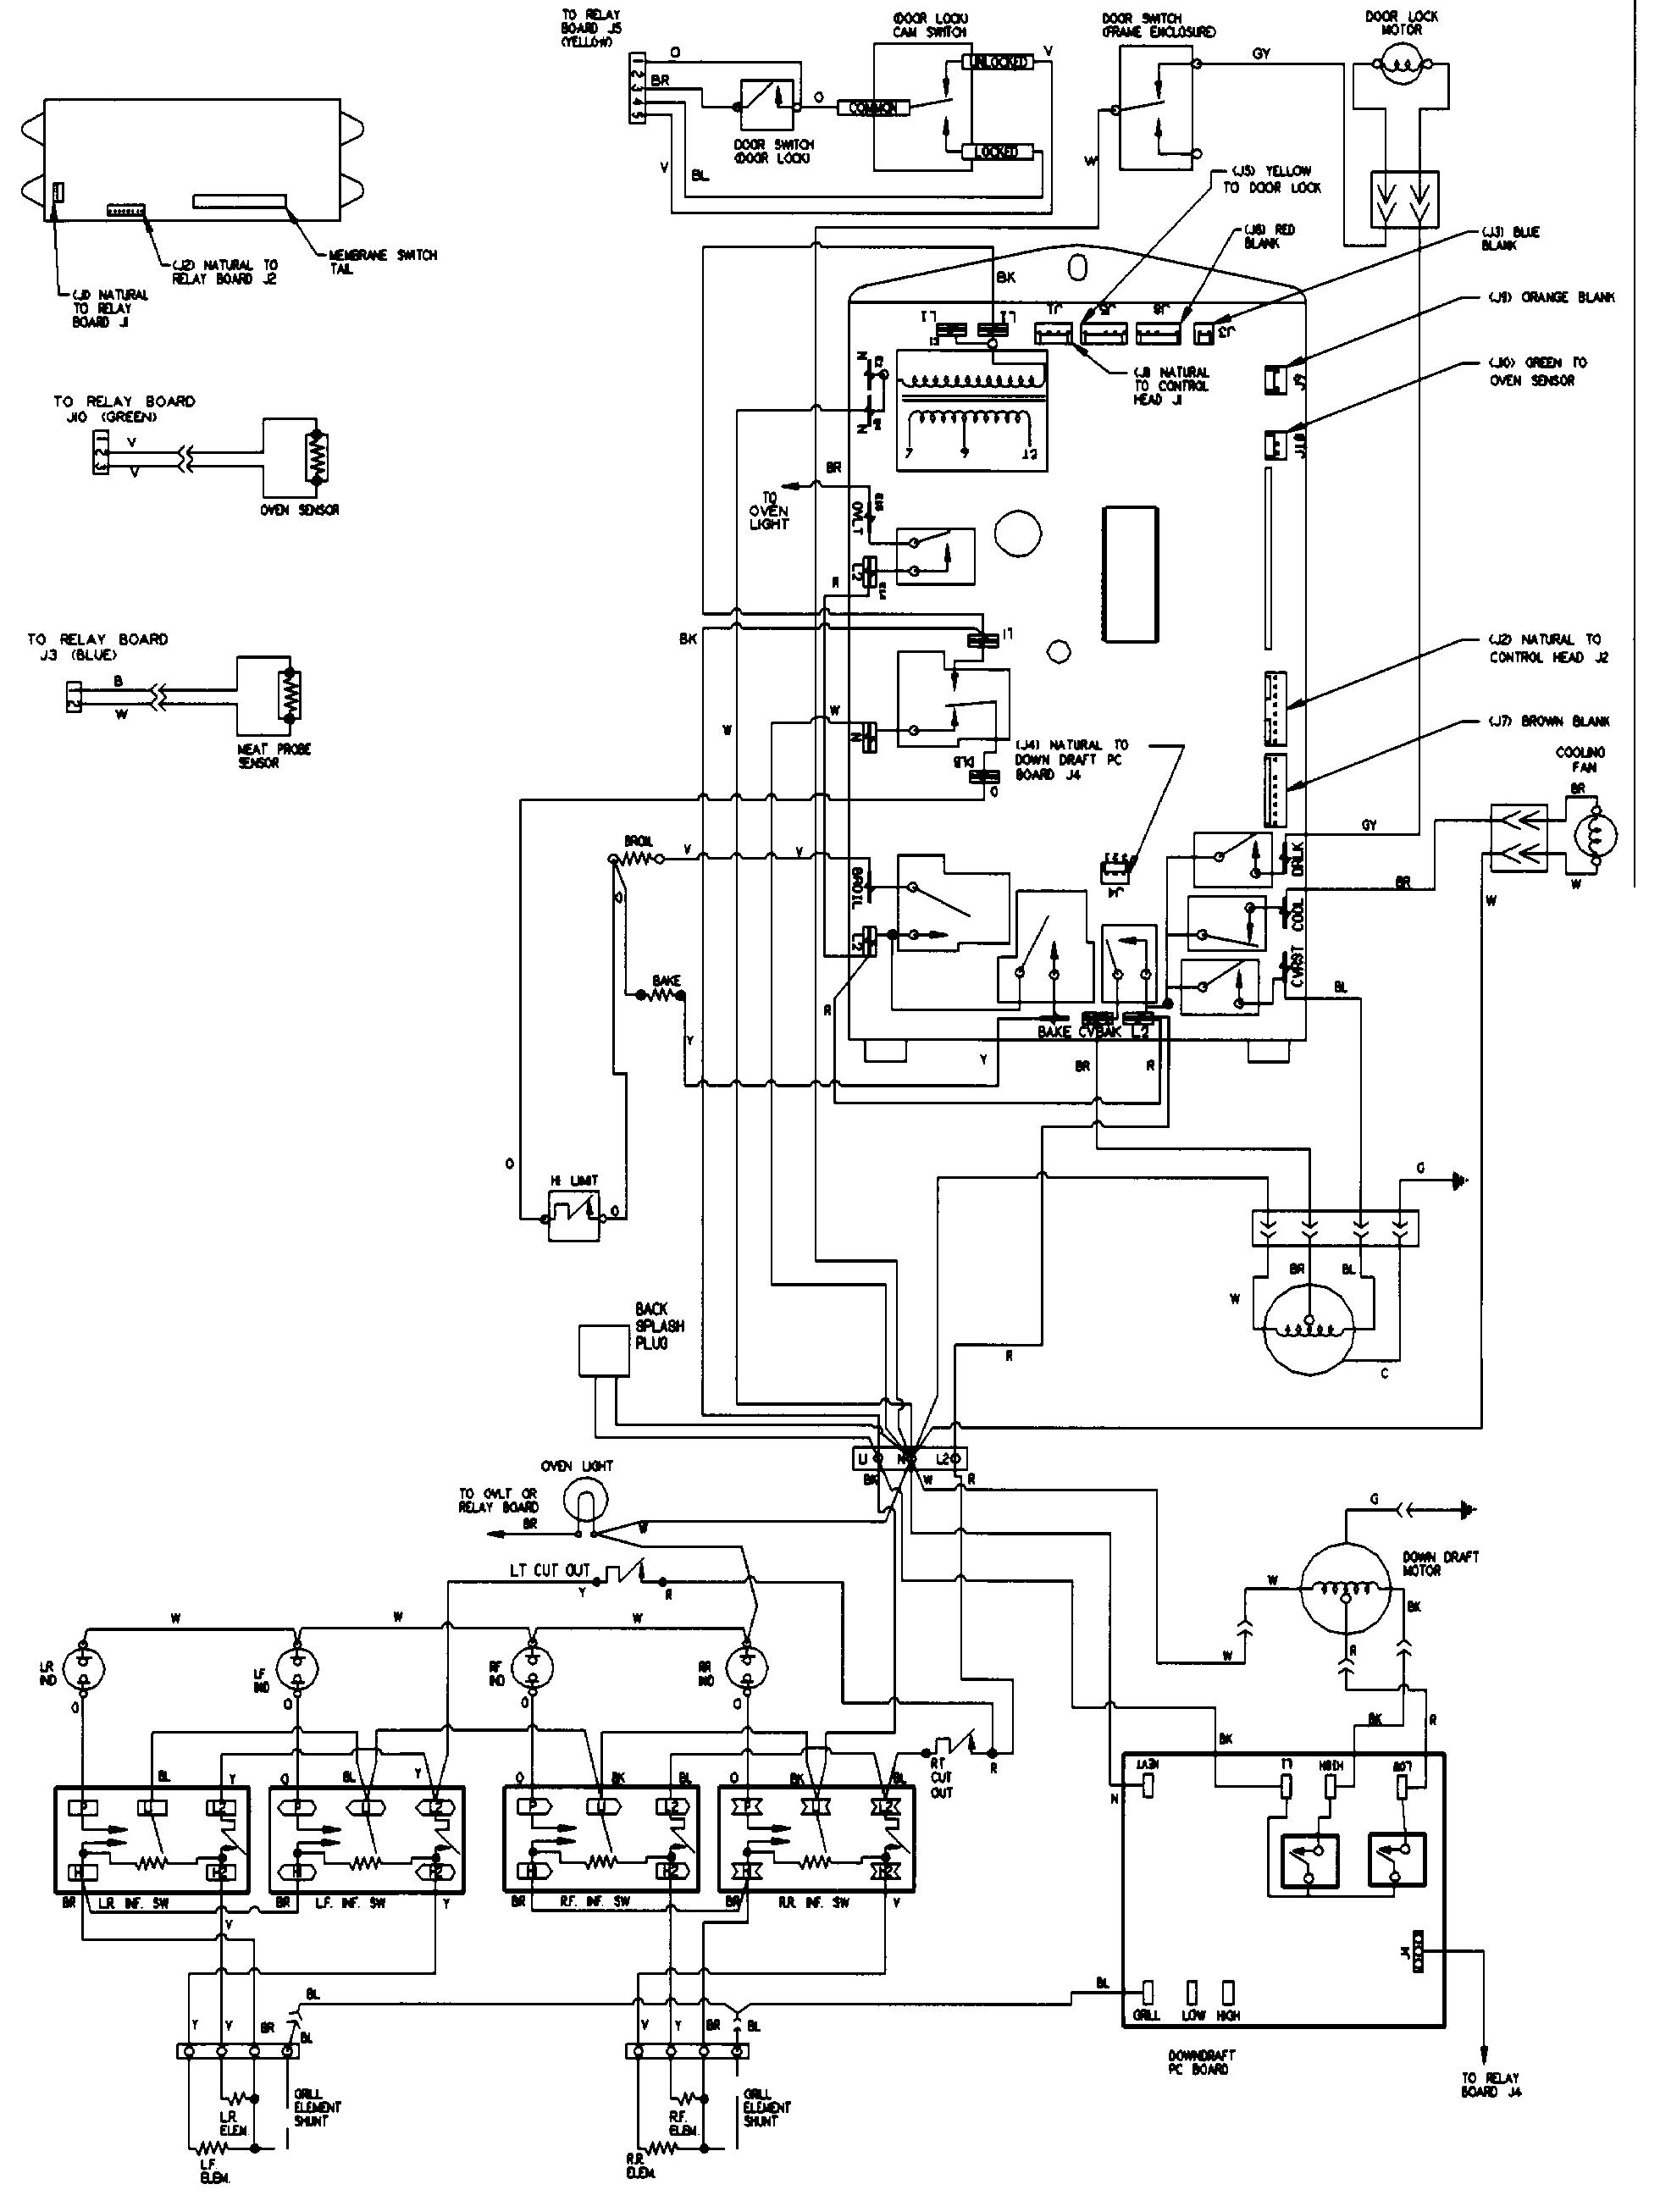 hight resolution of kitchenaid gas grill ignitor wiring diagram wiring diagram grillkitchenaid gas grill ignitor wiring diagram wiring diagram